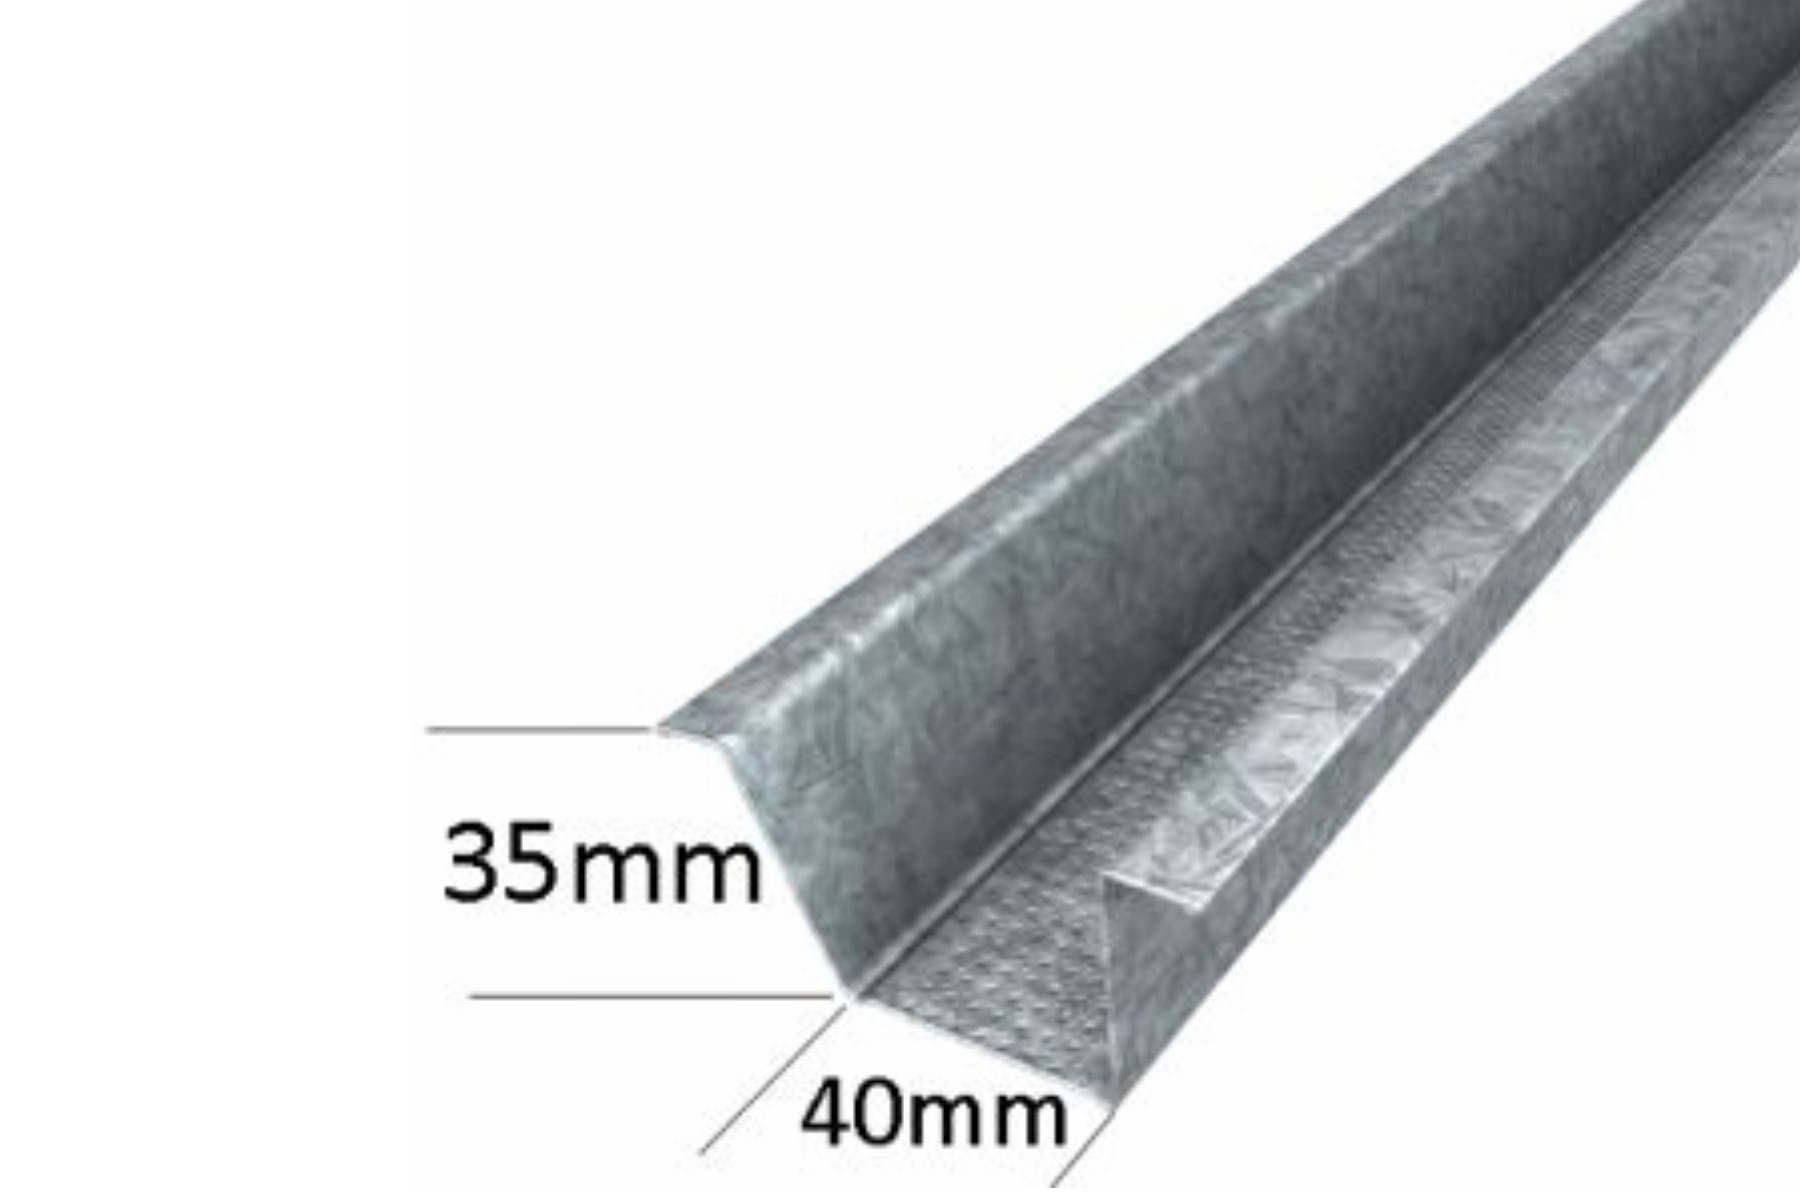 Rondo 310 35mm Ceiling Batten